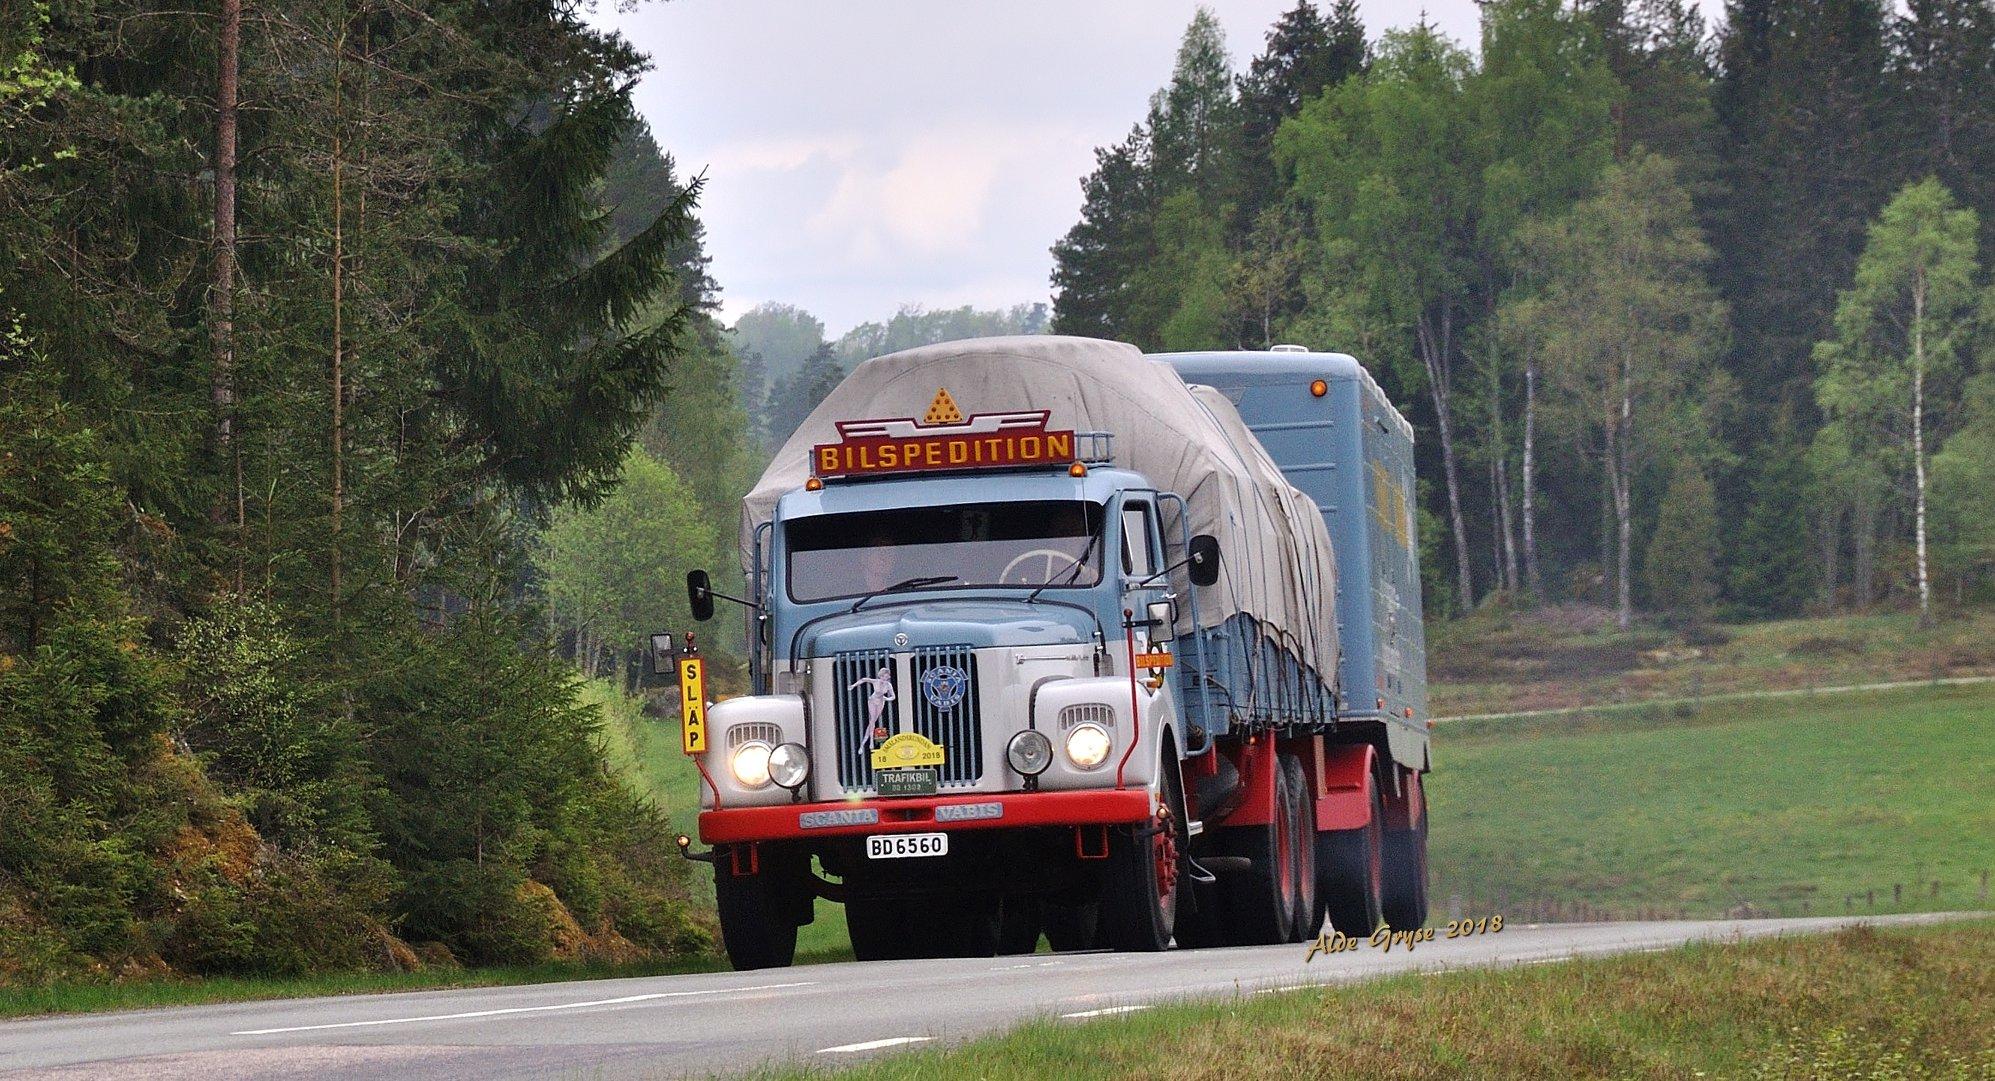 Scania-LS-7550-by-Bjorn-Nilsson-of-Strangnas